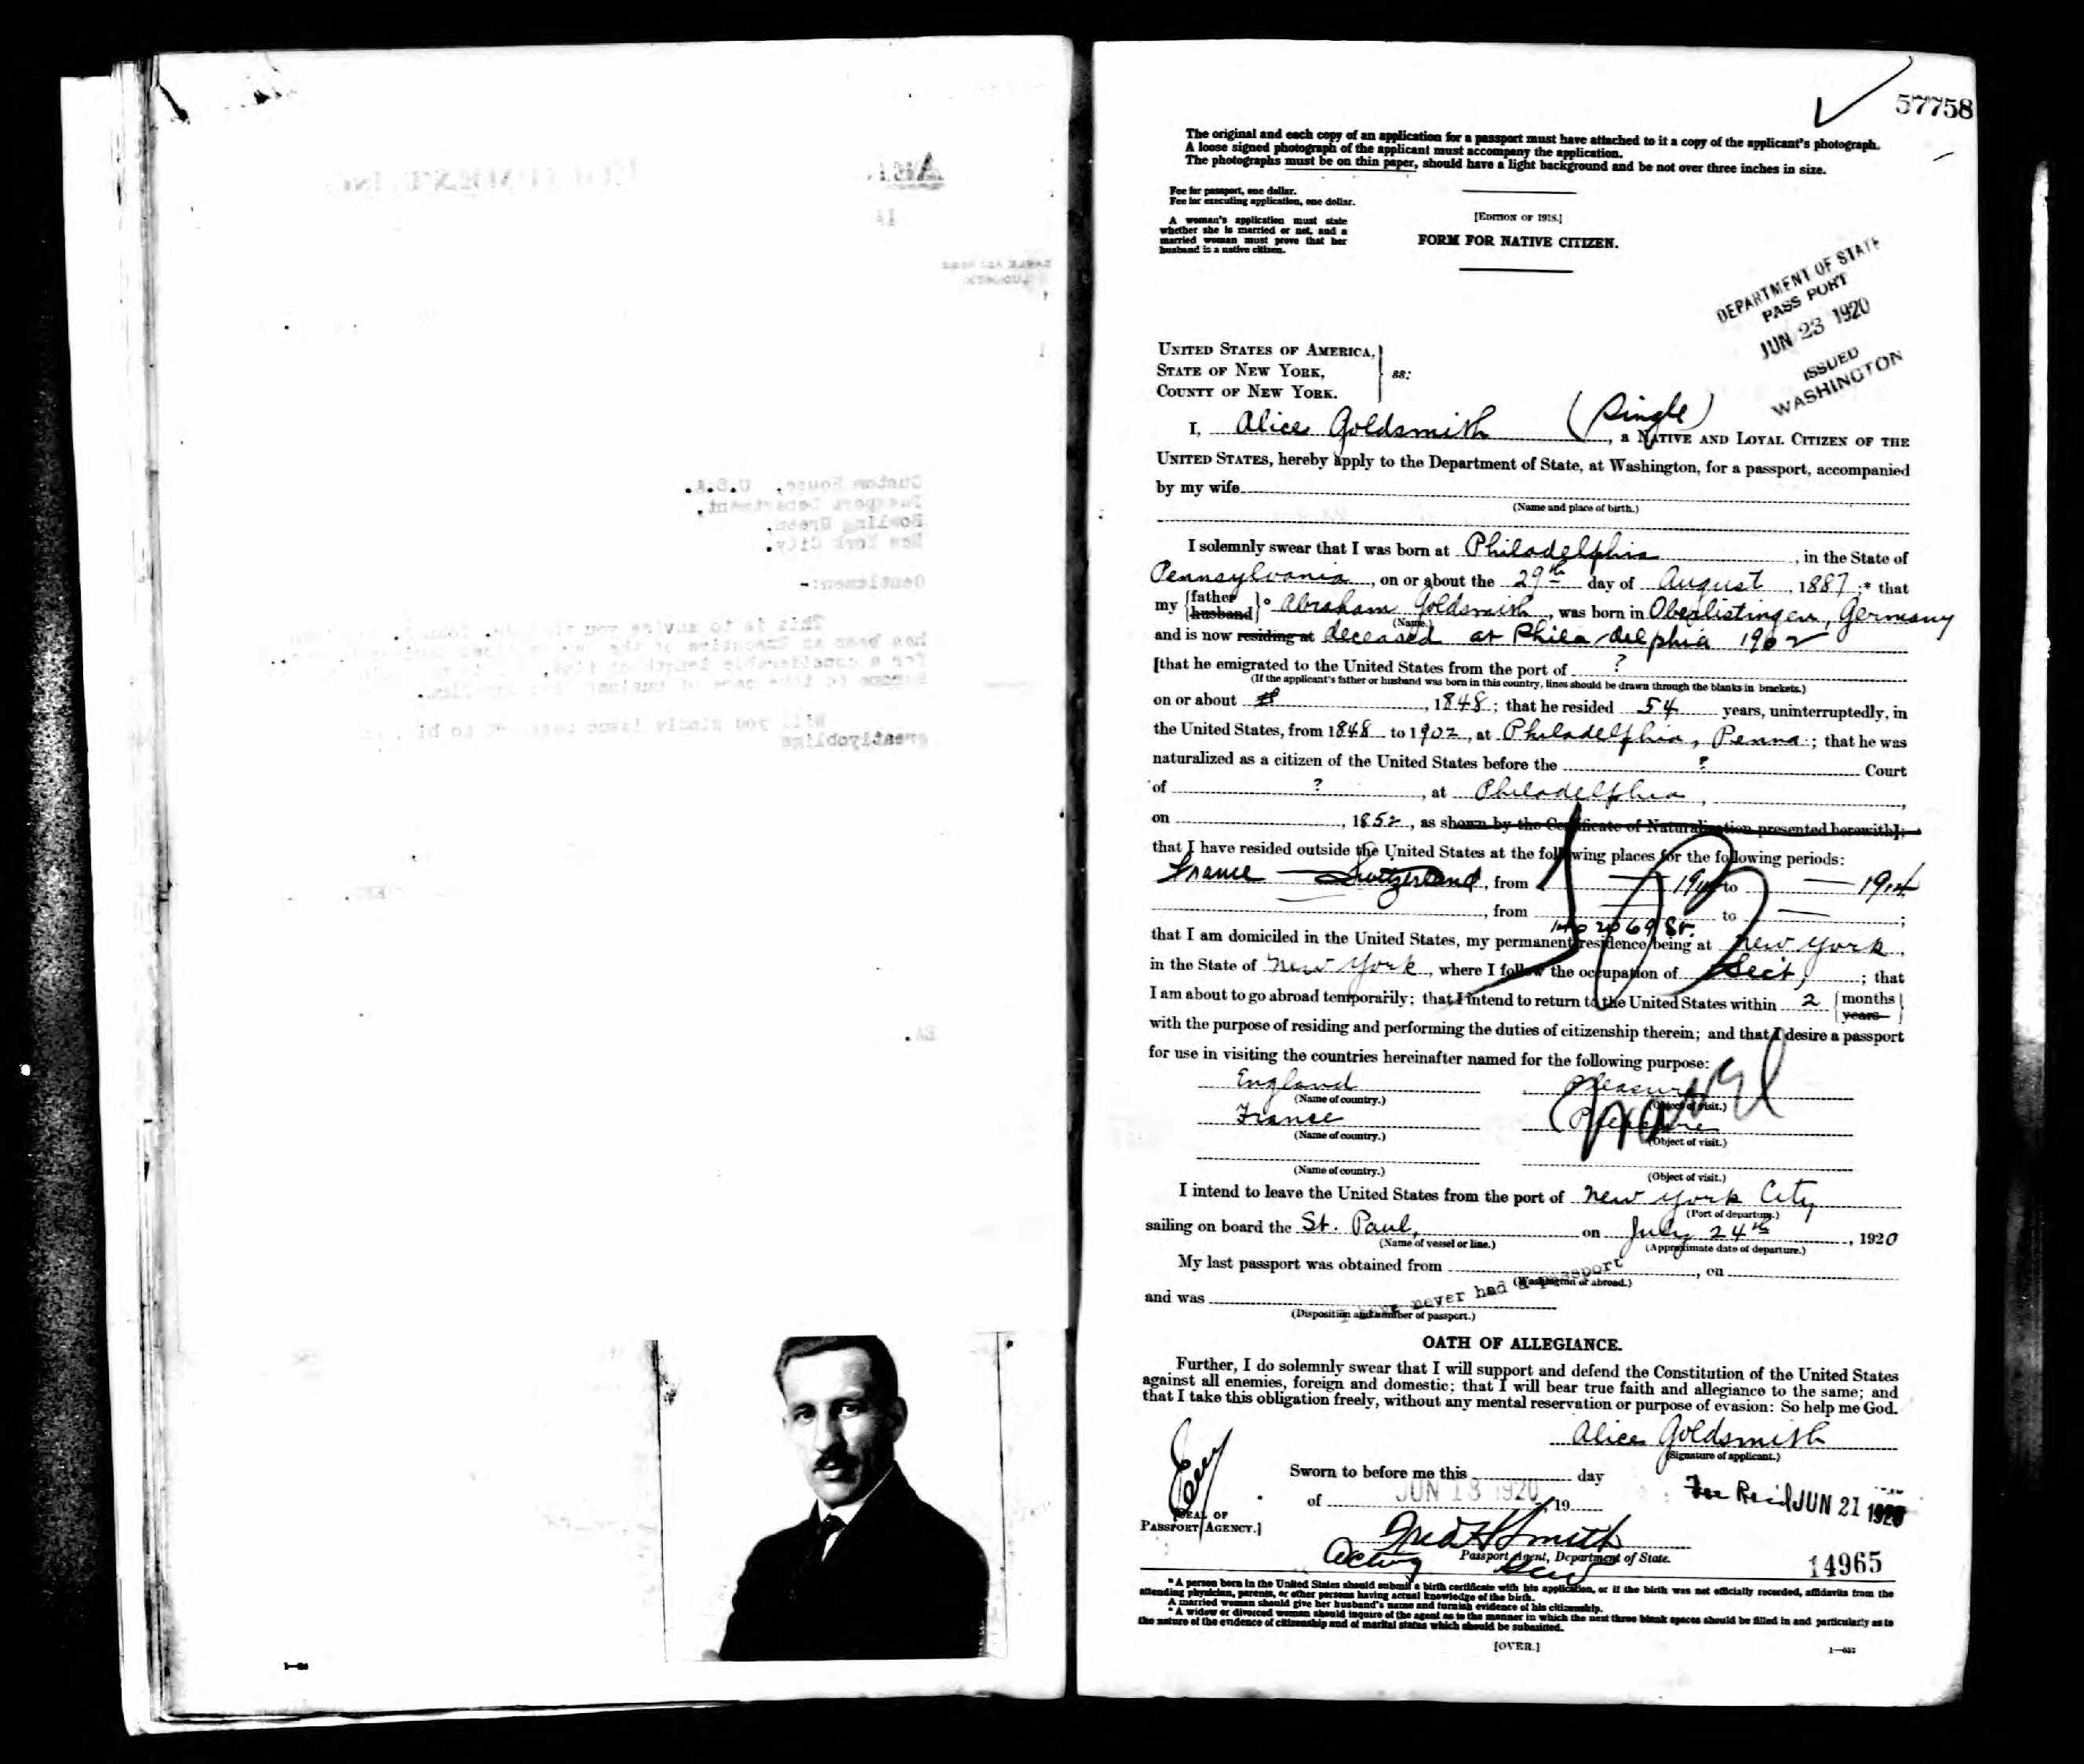 genealogy | Brotmanblog: A Family Journey